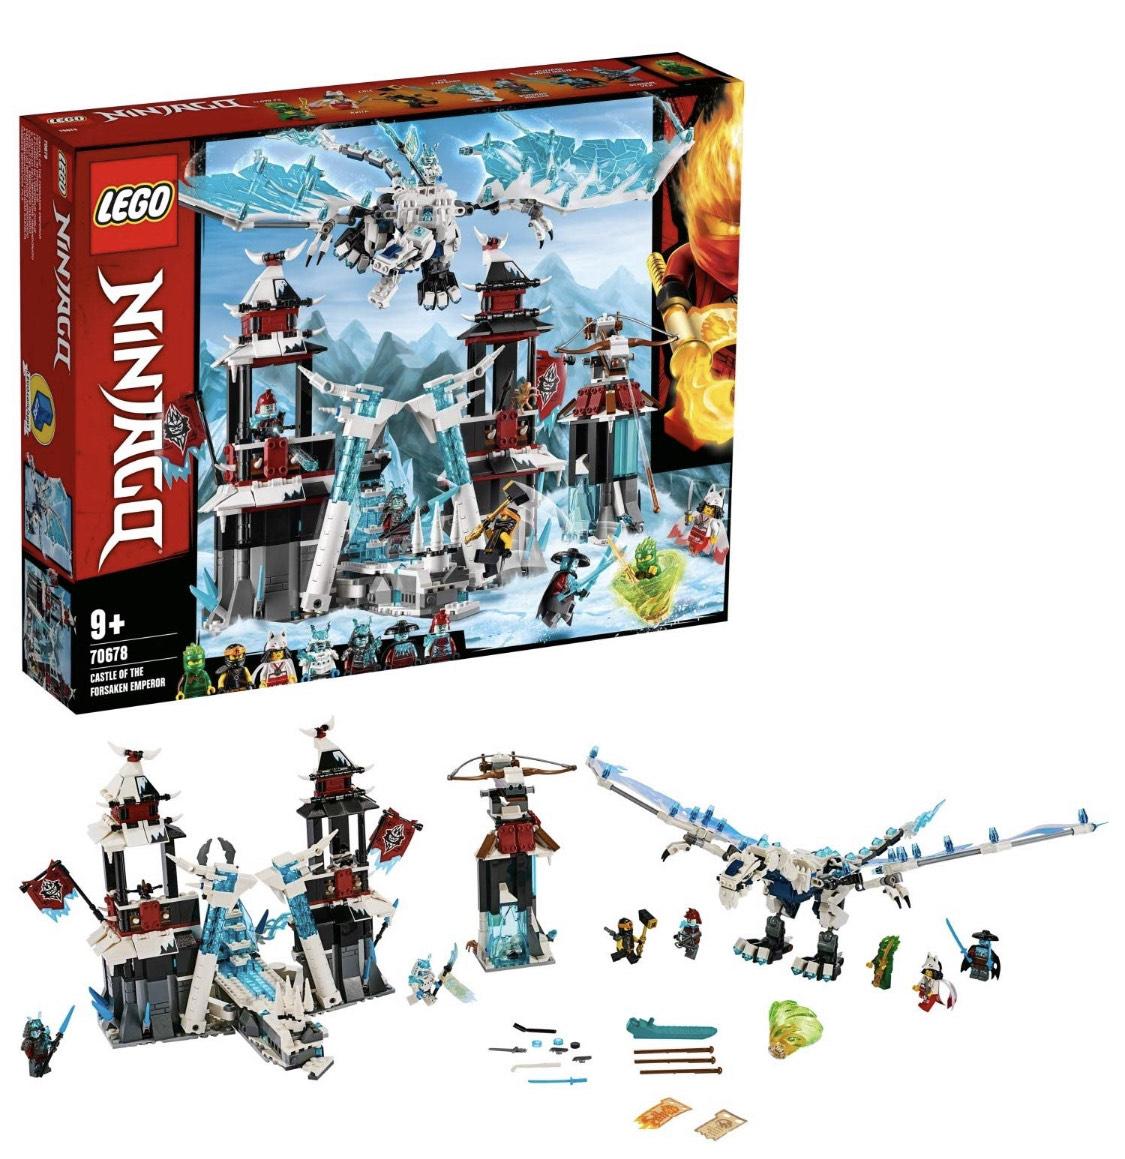 LEGO 70678 NINJAGO Castle of the Forsaken Emperor Set with Ice Dragon Toy, Masters of Spinjitzu Playset £61.60 @ Amazon